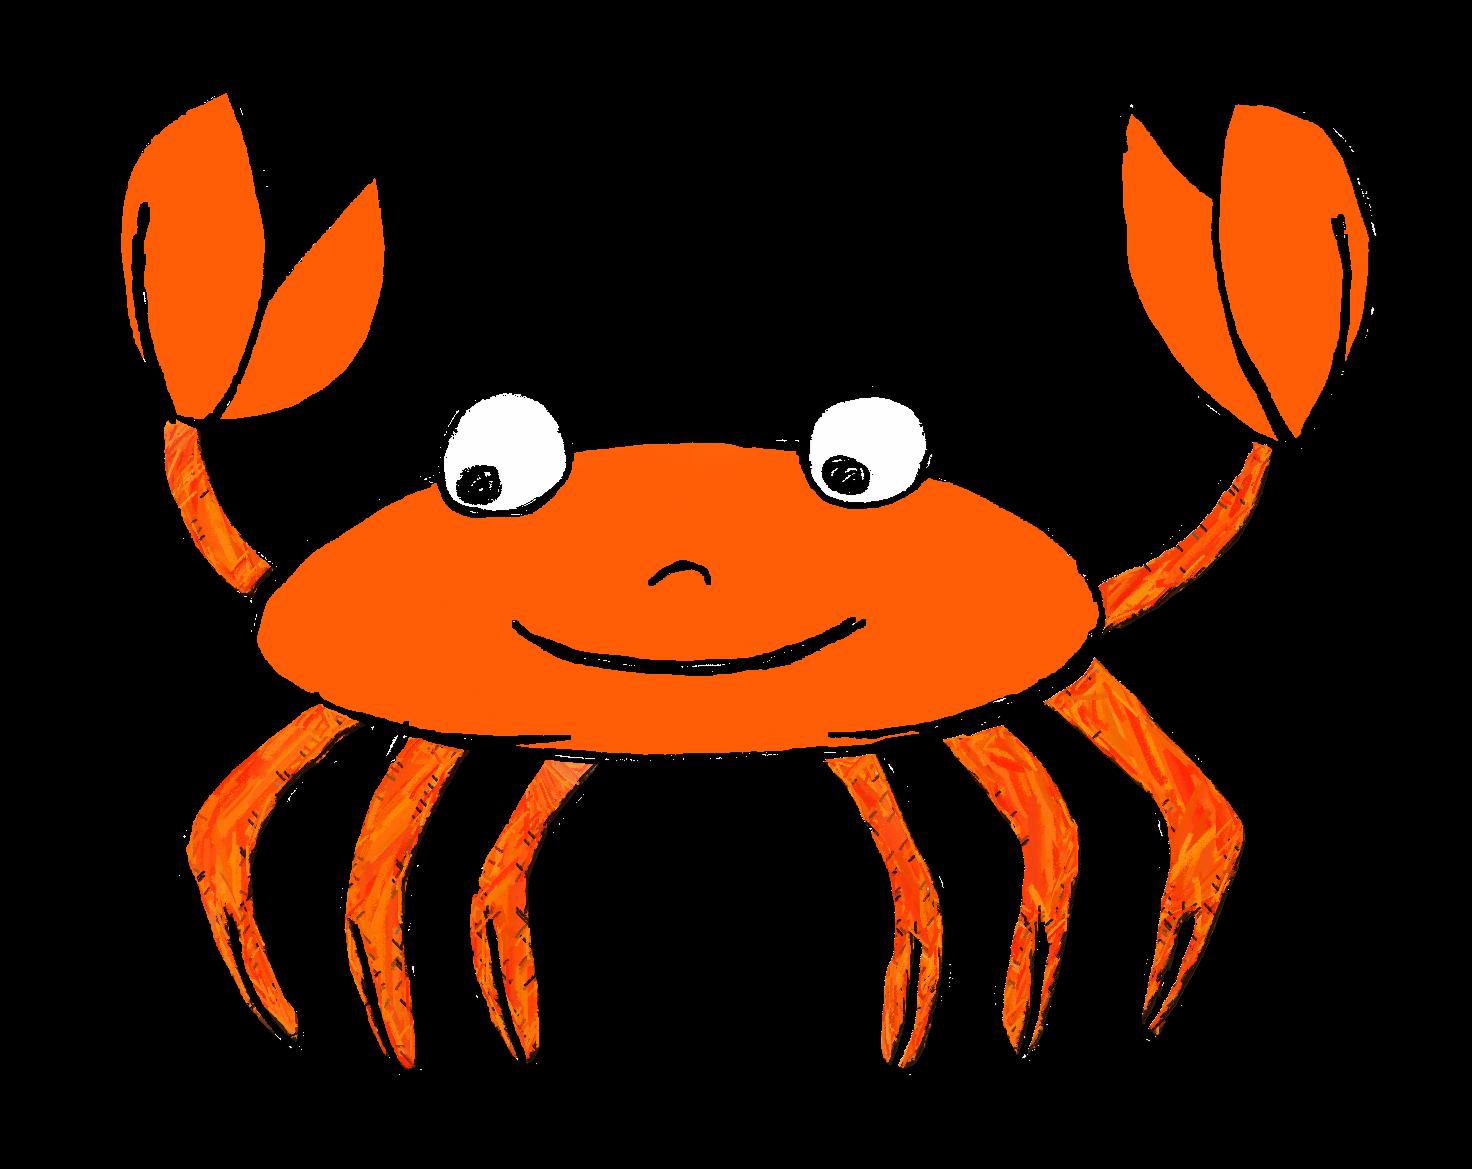 1472x1169 Crab Clipart Black And White Clipart Panda